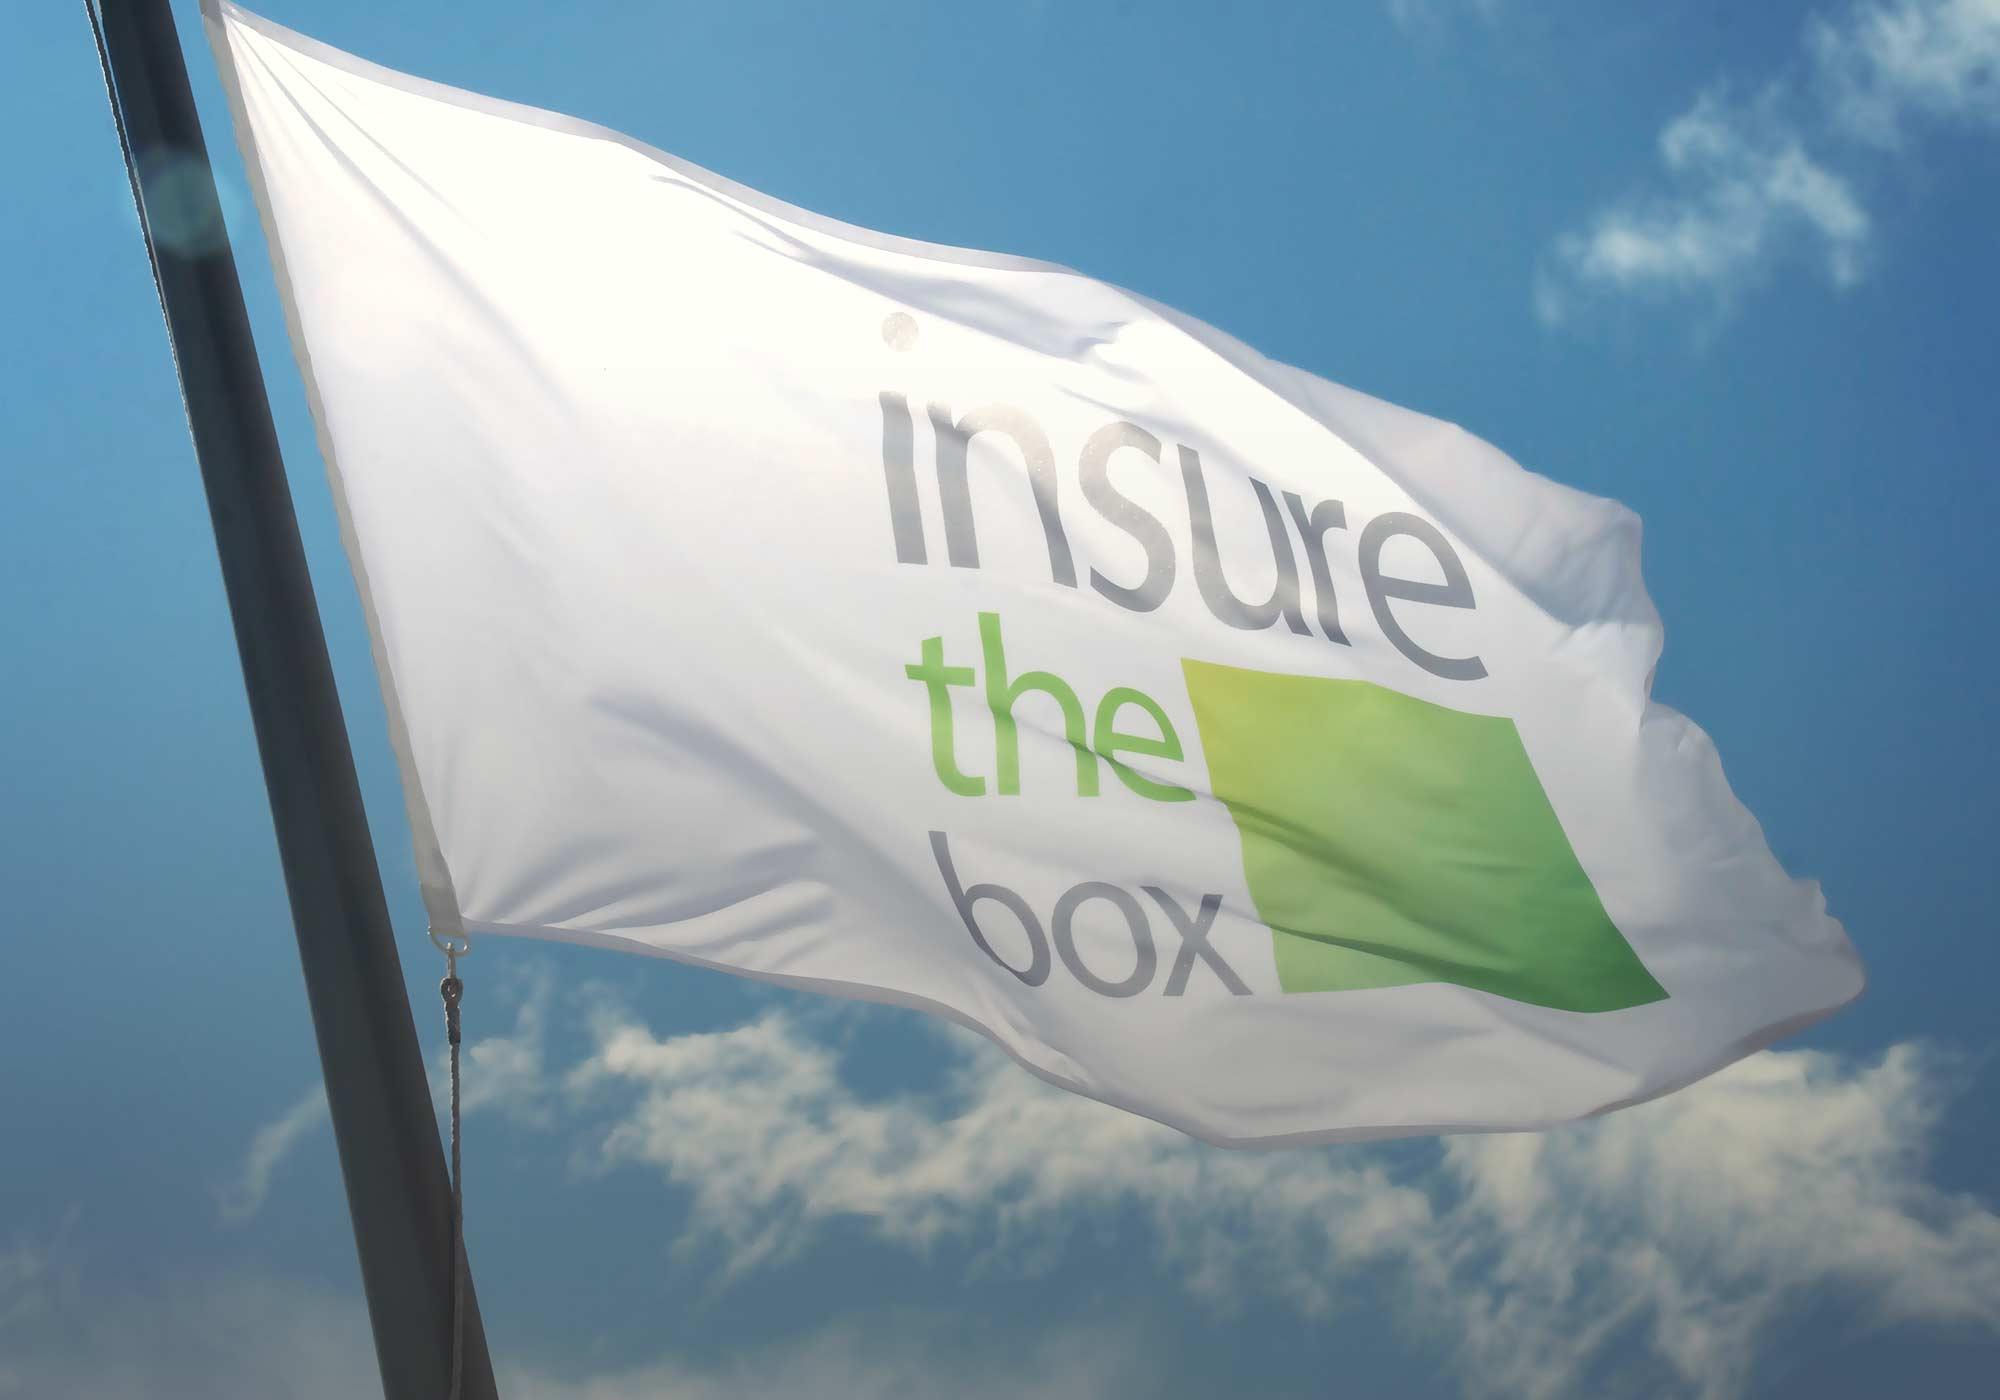 Insurethebox flag